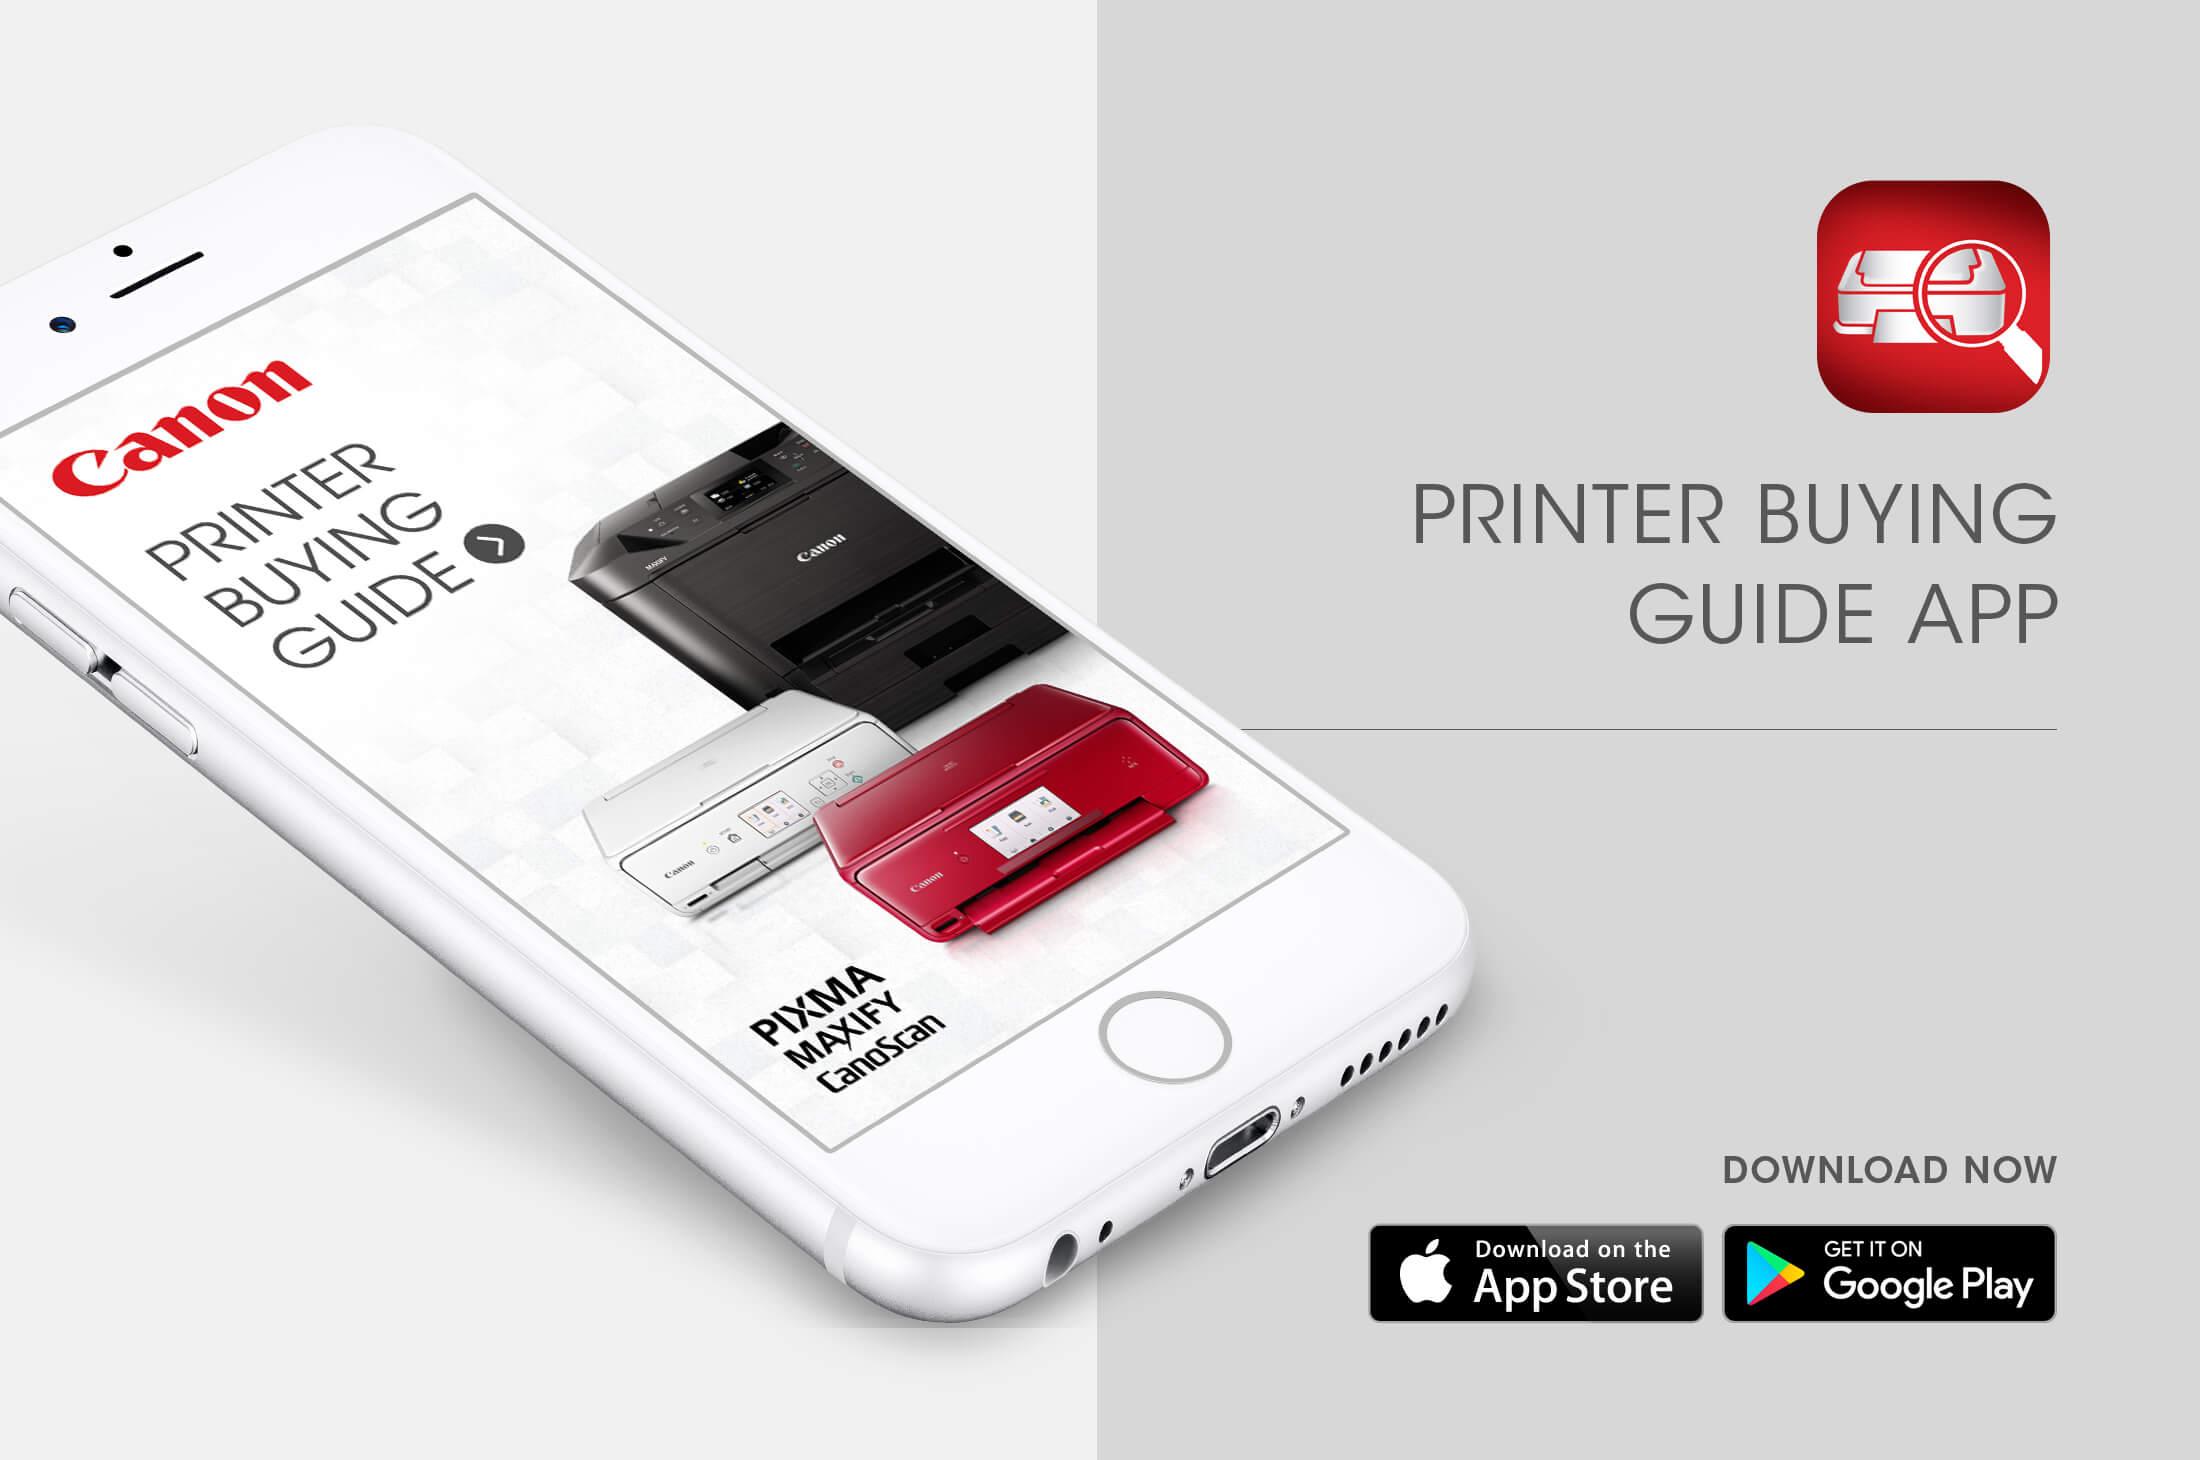 Canon Printer Buying Guide App   w3-o design + interactive lab